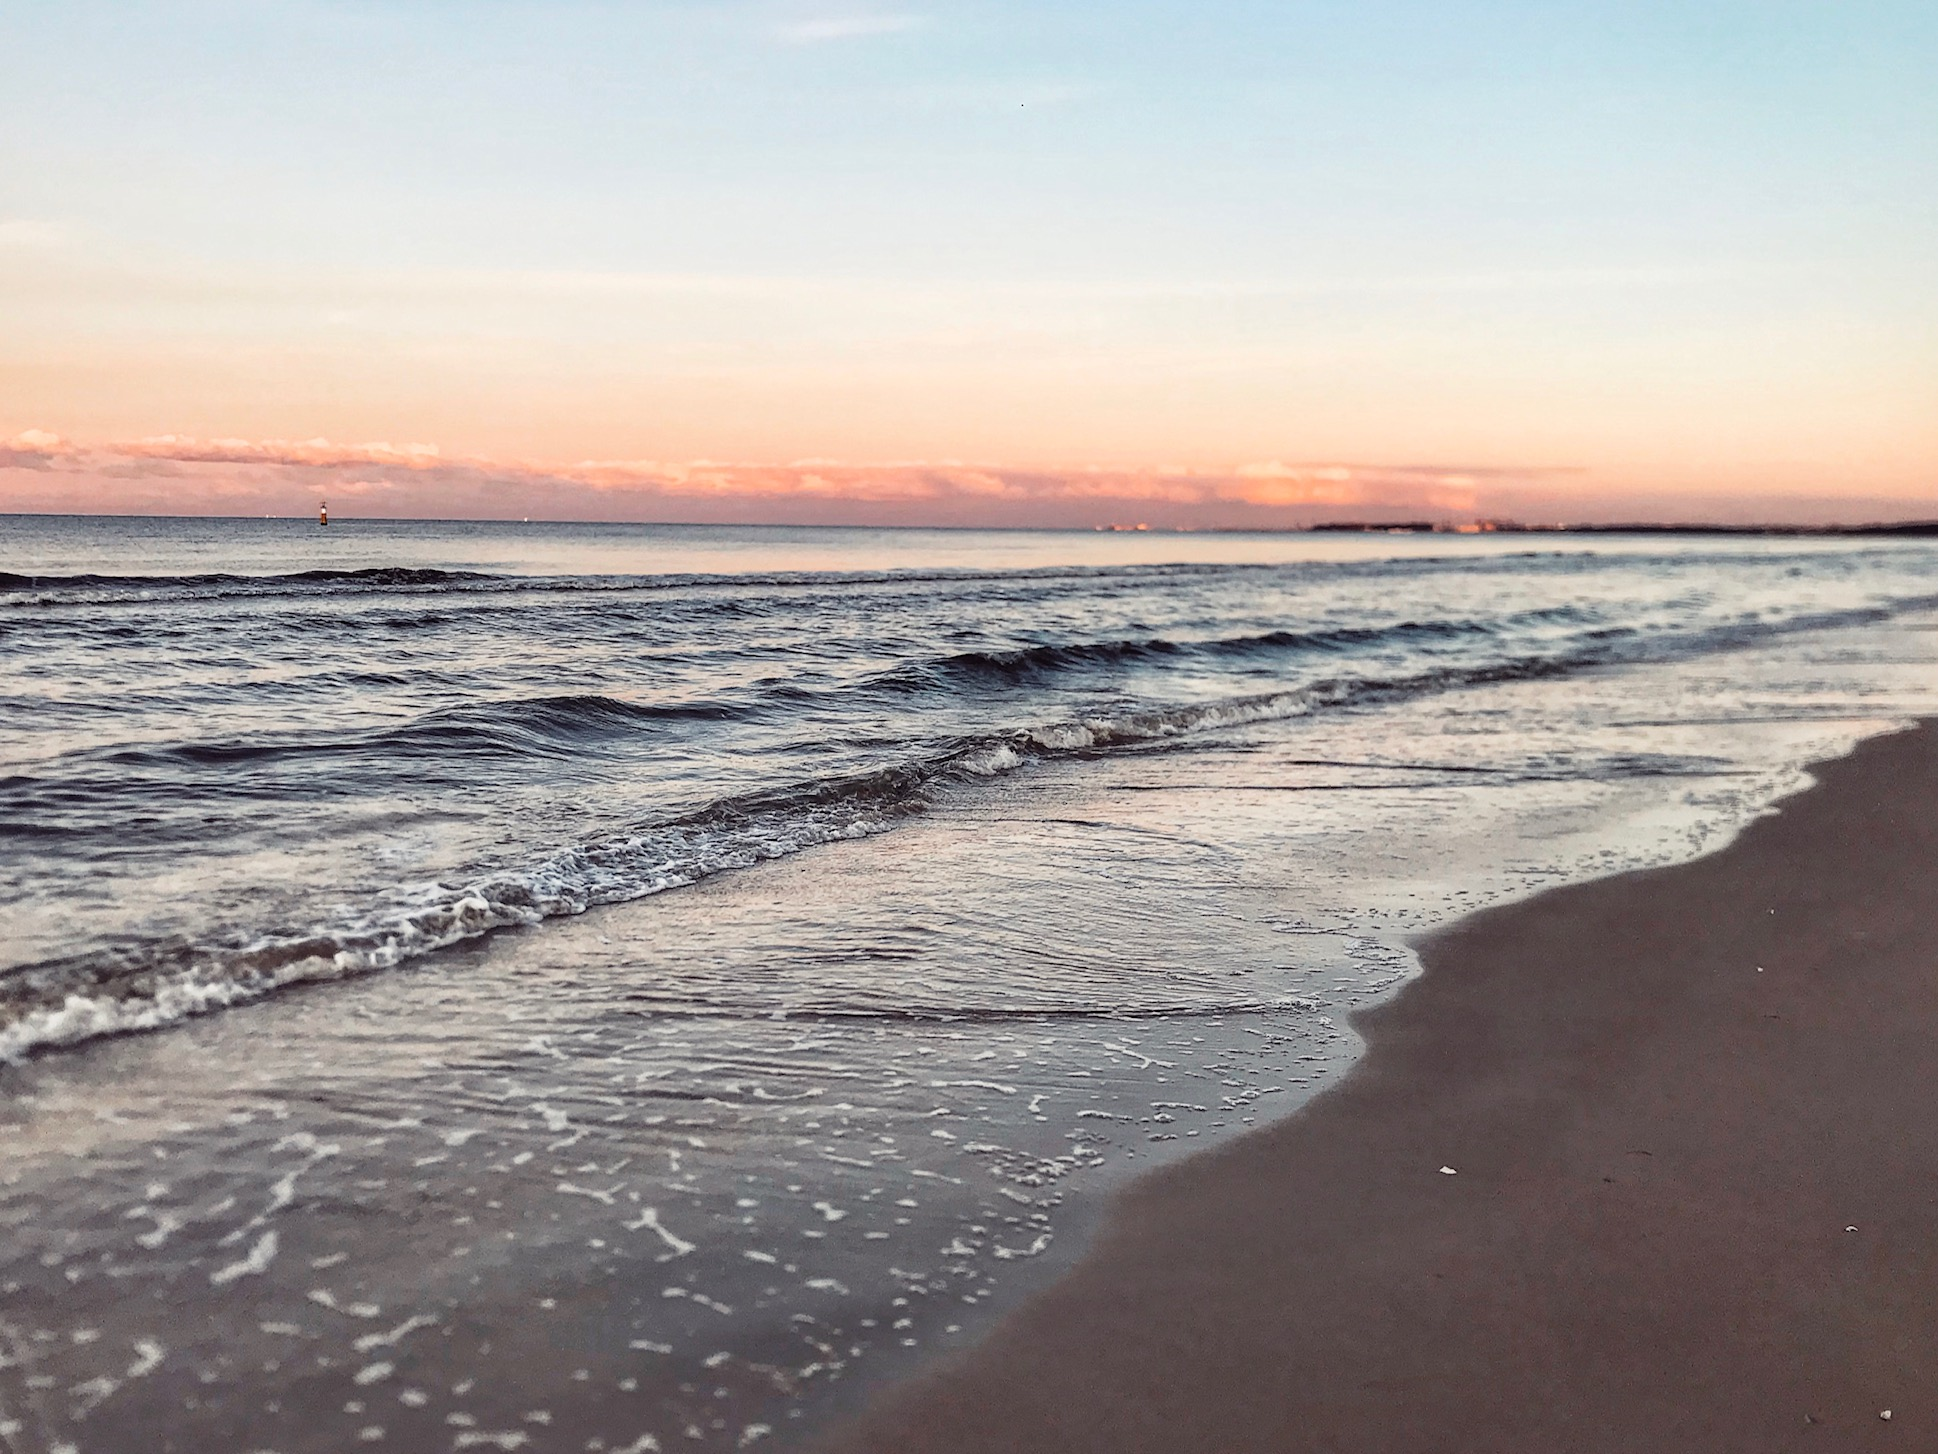 Sopockie morze